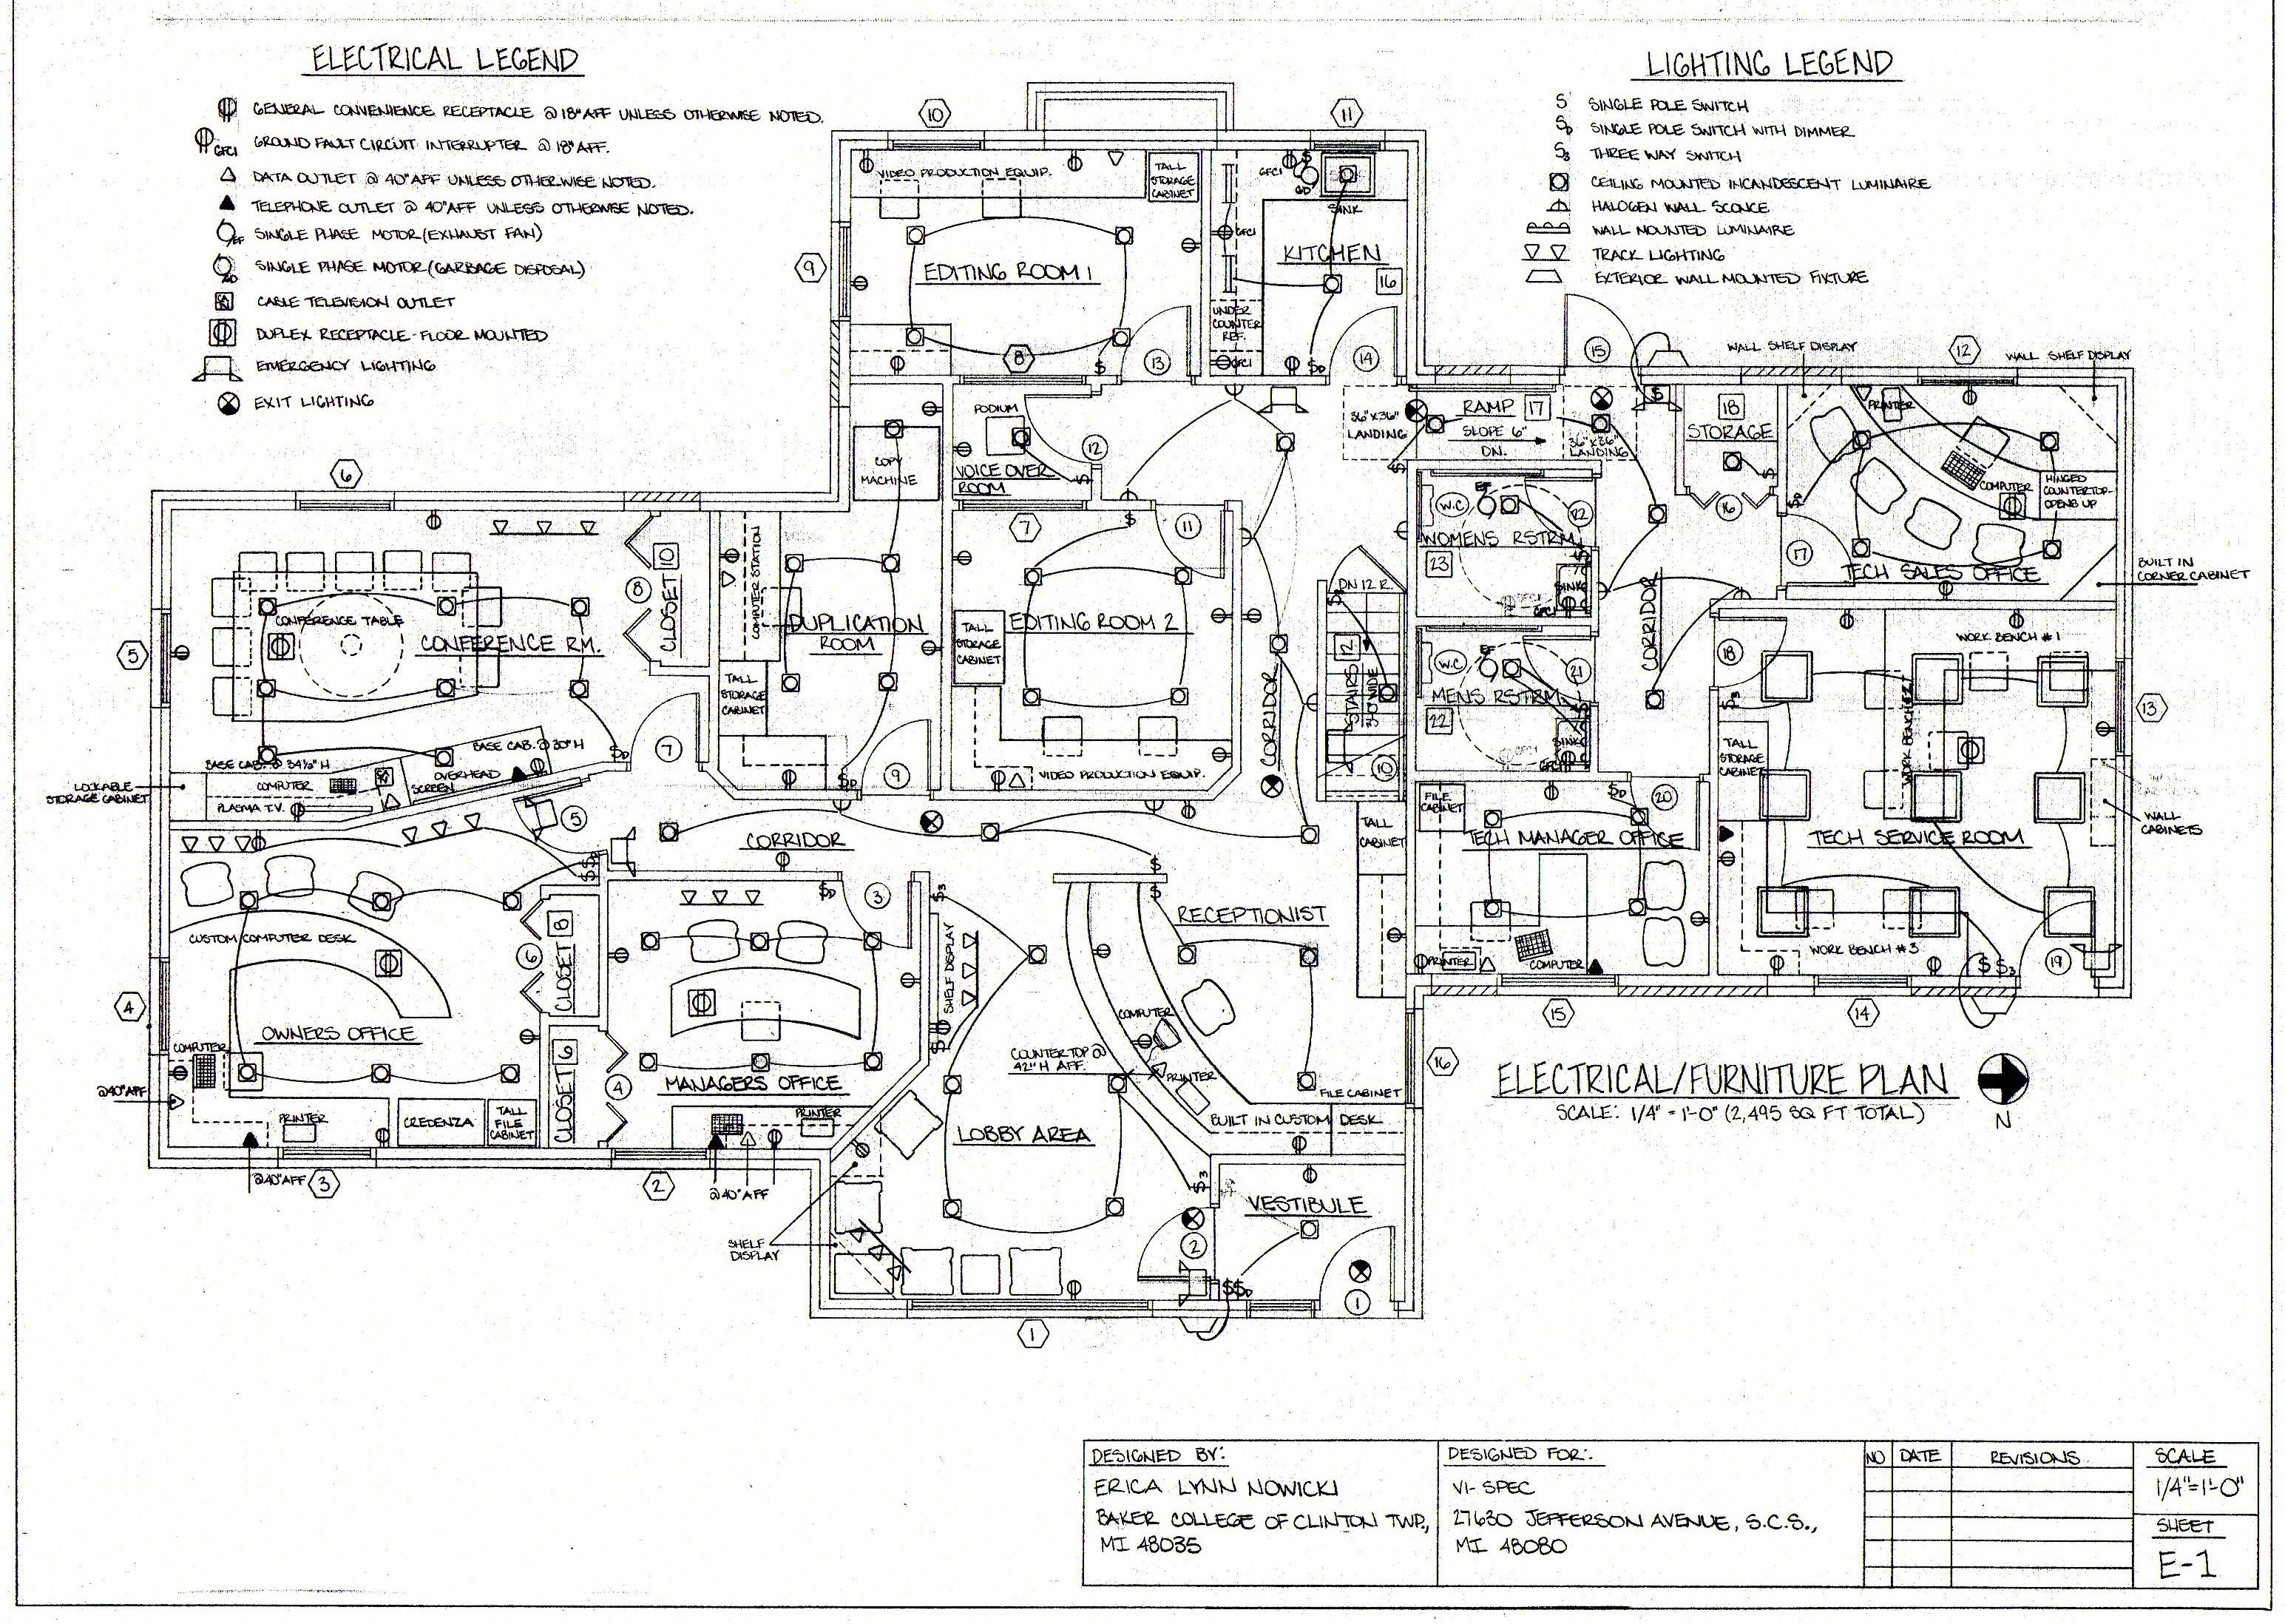 Electrical Building Plan - Merzie.net